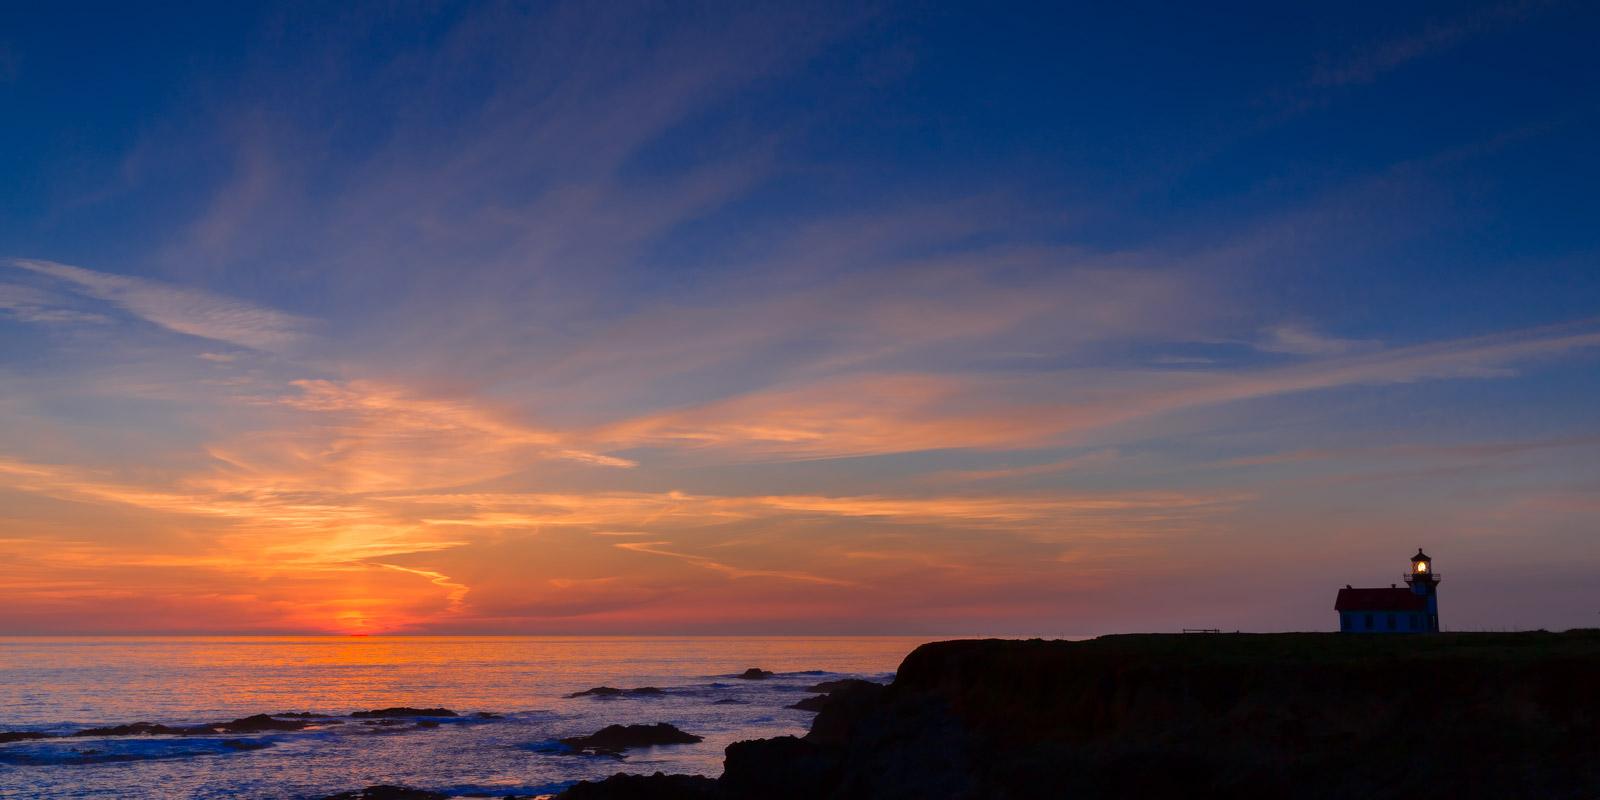 California, Mendocino, Coast, Cabrillo, Lighthouse, Sunset, coast, California Coast, Pacific Coast, photo